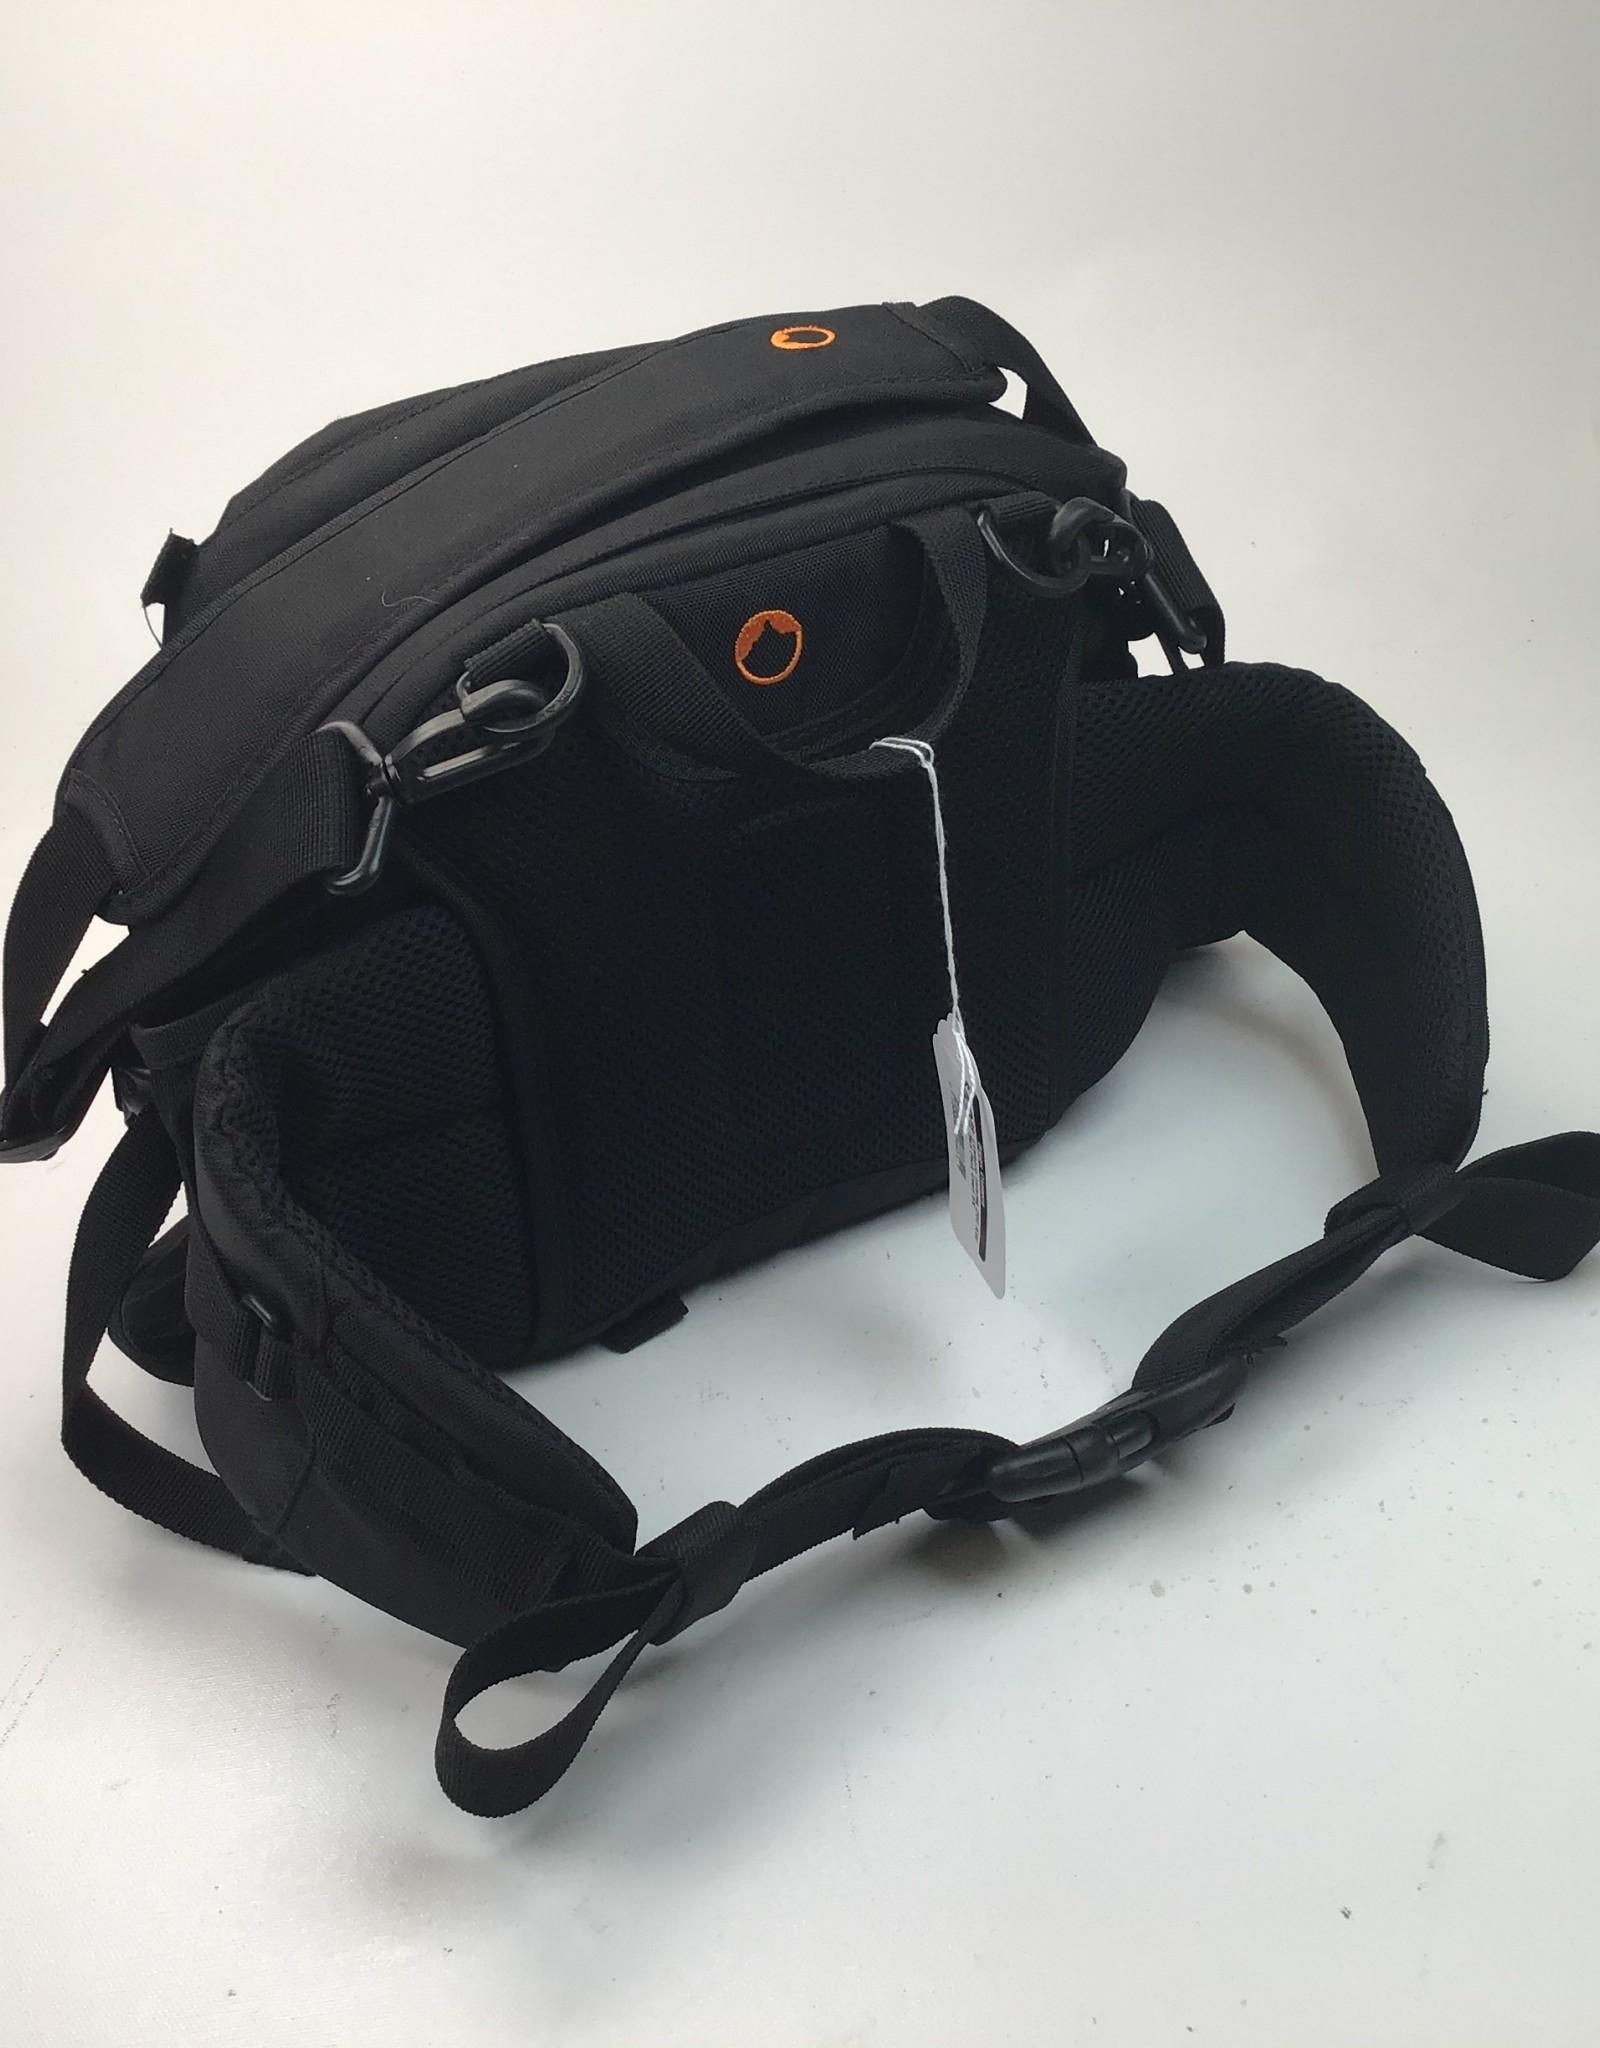 LOWEPRO Lowepro Inverse 200 AW Belt Pack Used EX